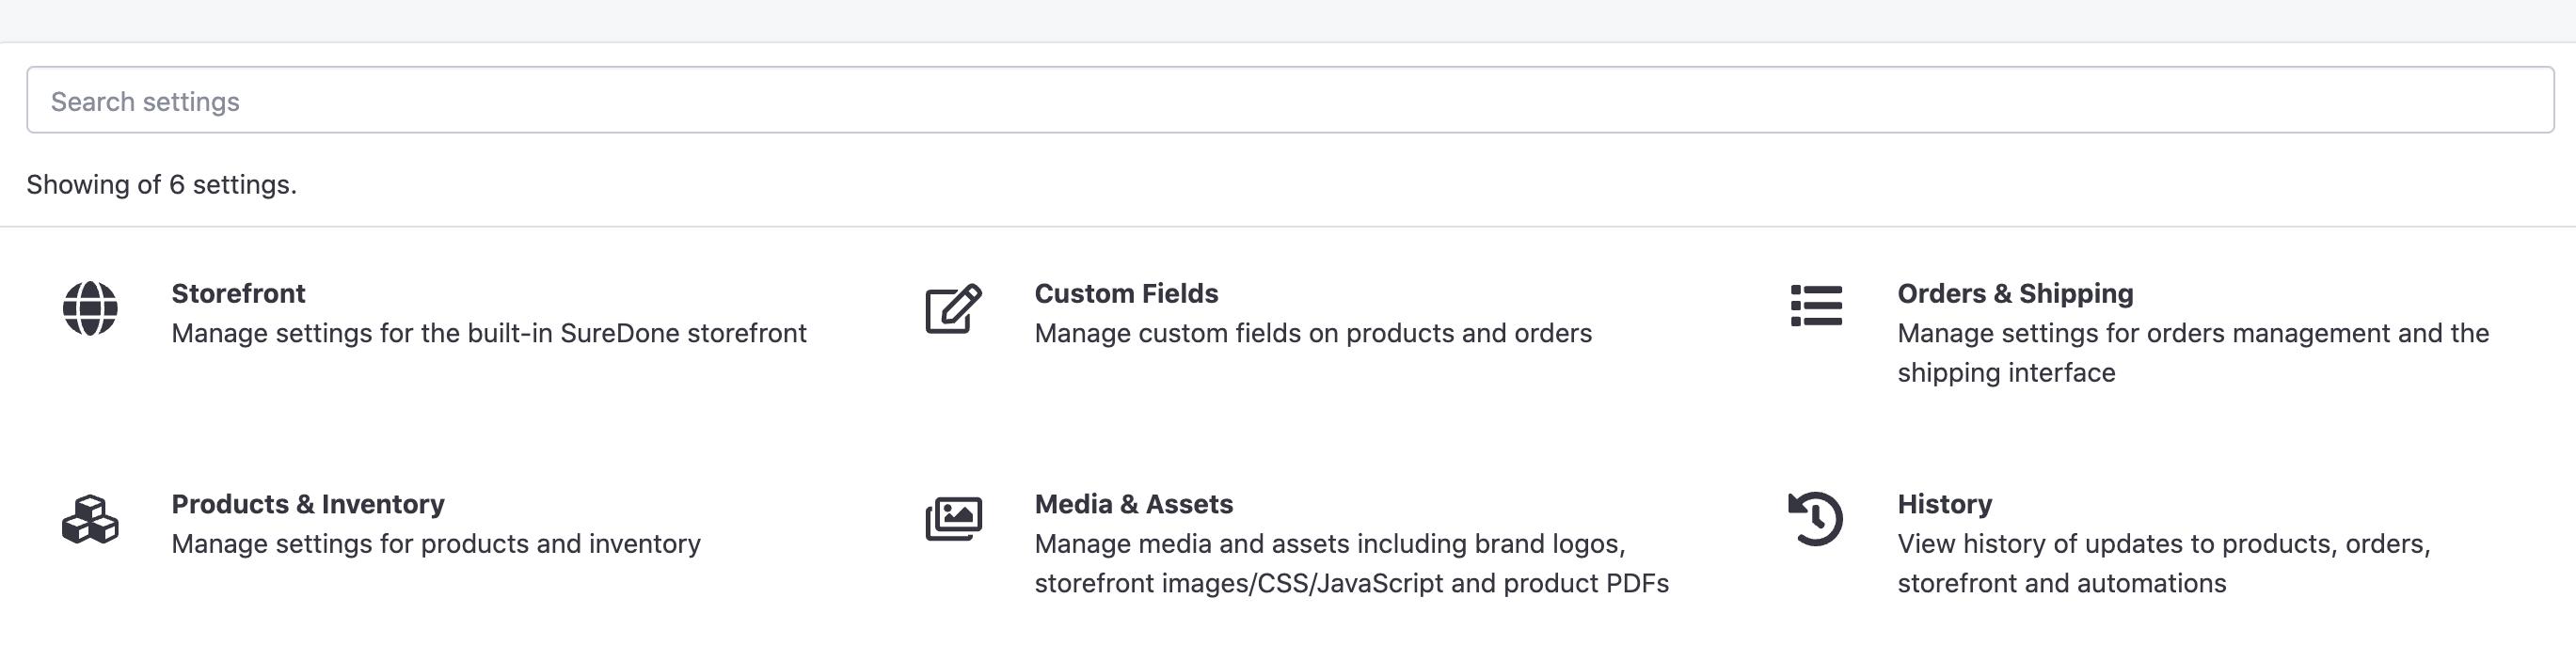 User Interface Settings